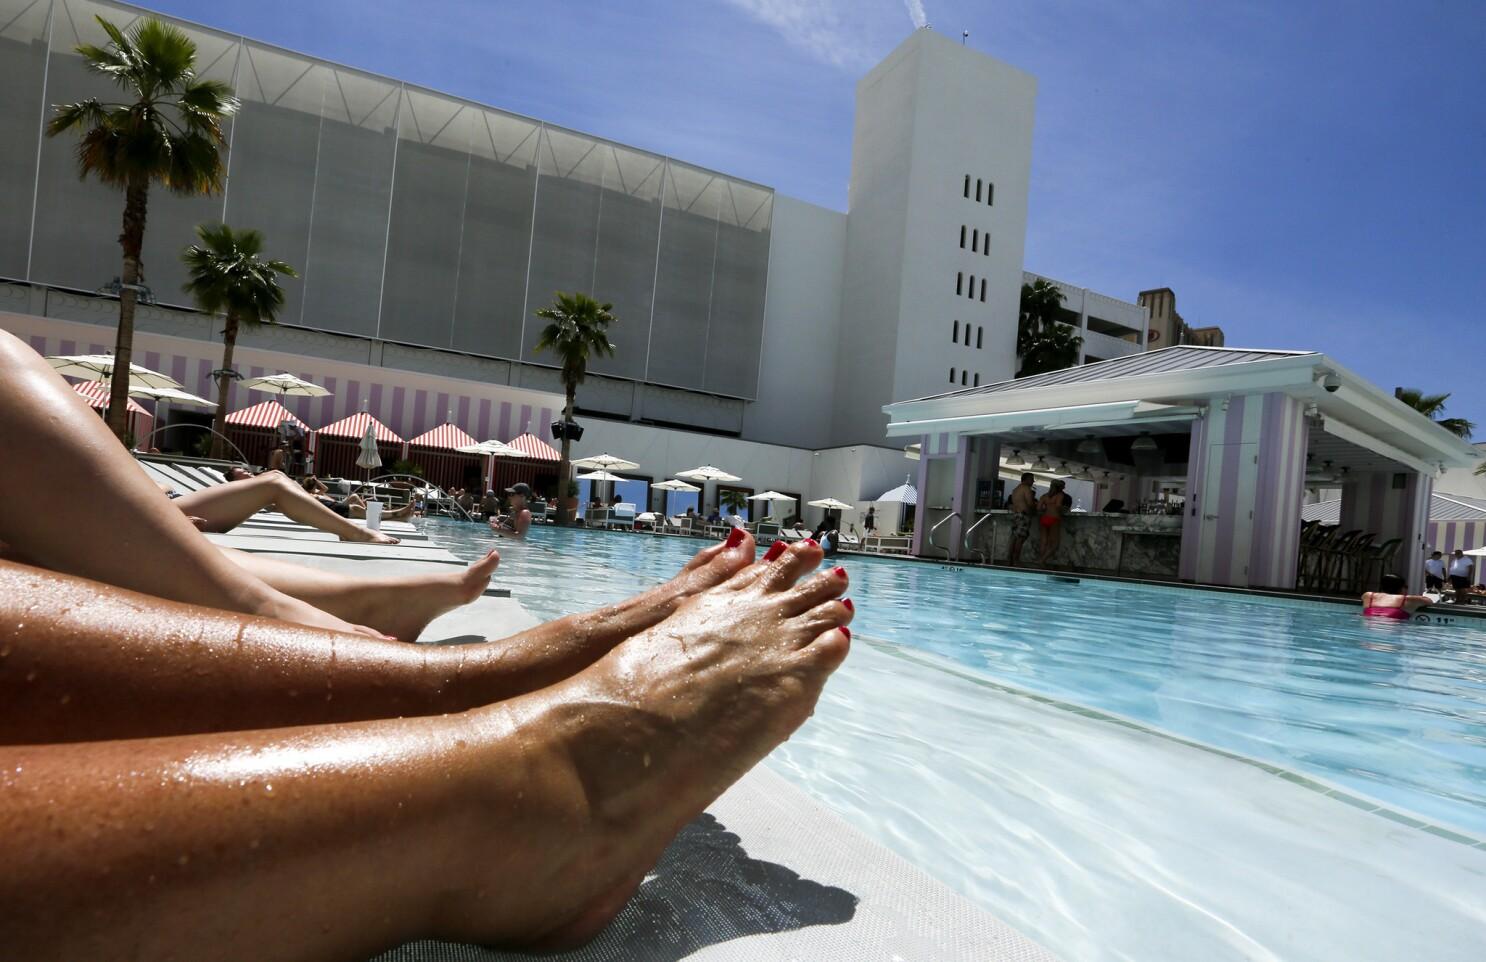 Summer Pool Season Opens In Las Vegas 11 Resorts That Rock It Los Angeles Times